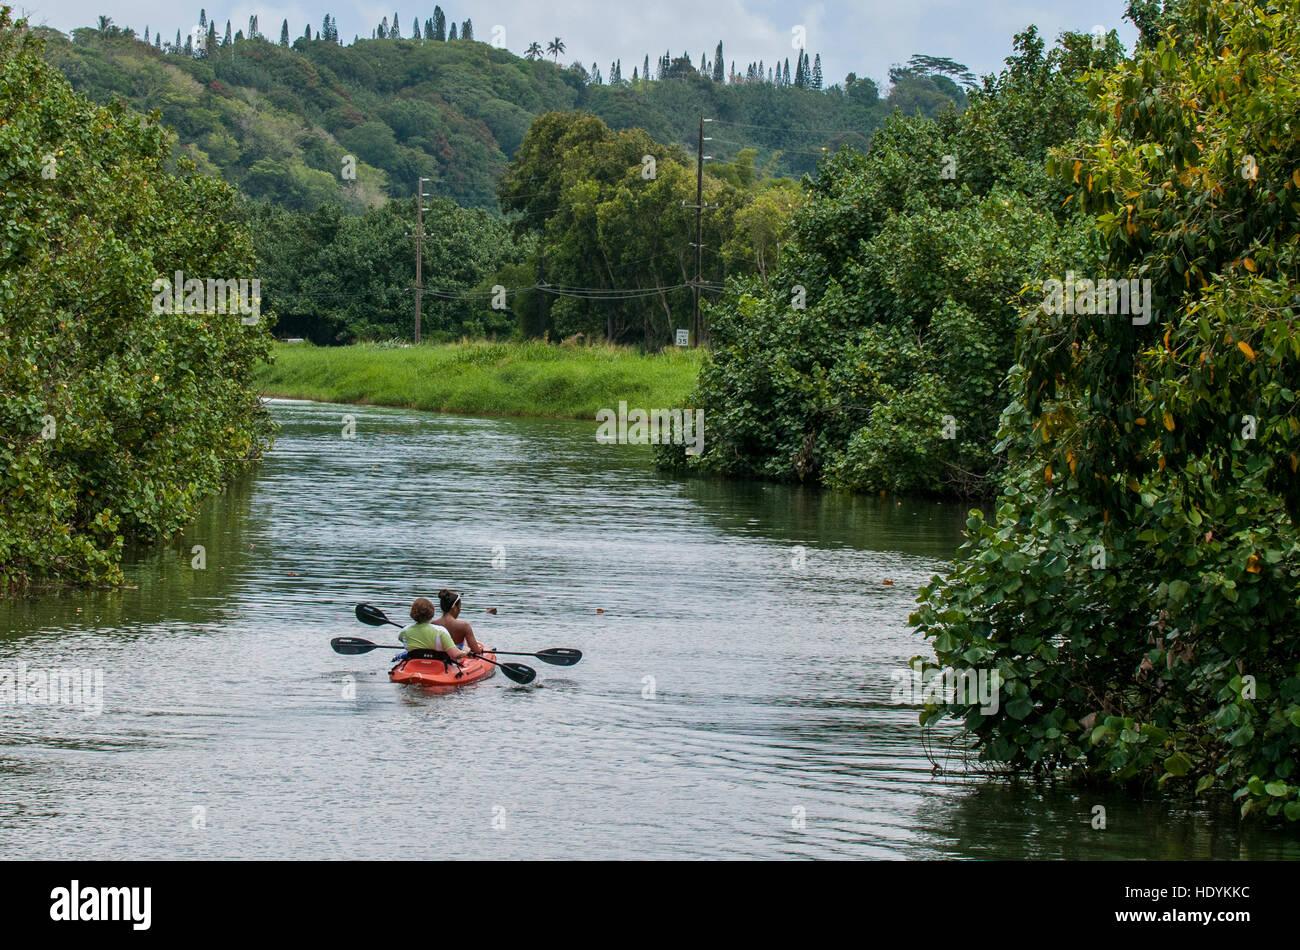 Kayaking on the Wailua River, Kauai, Hawaii Stock Photo